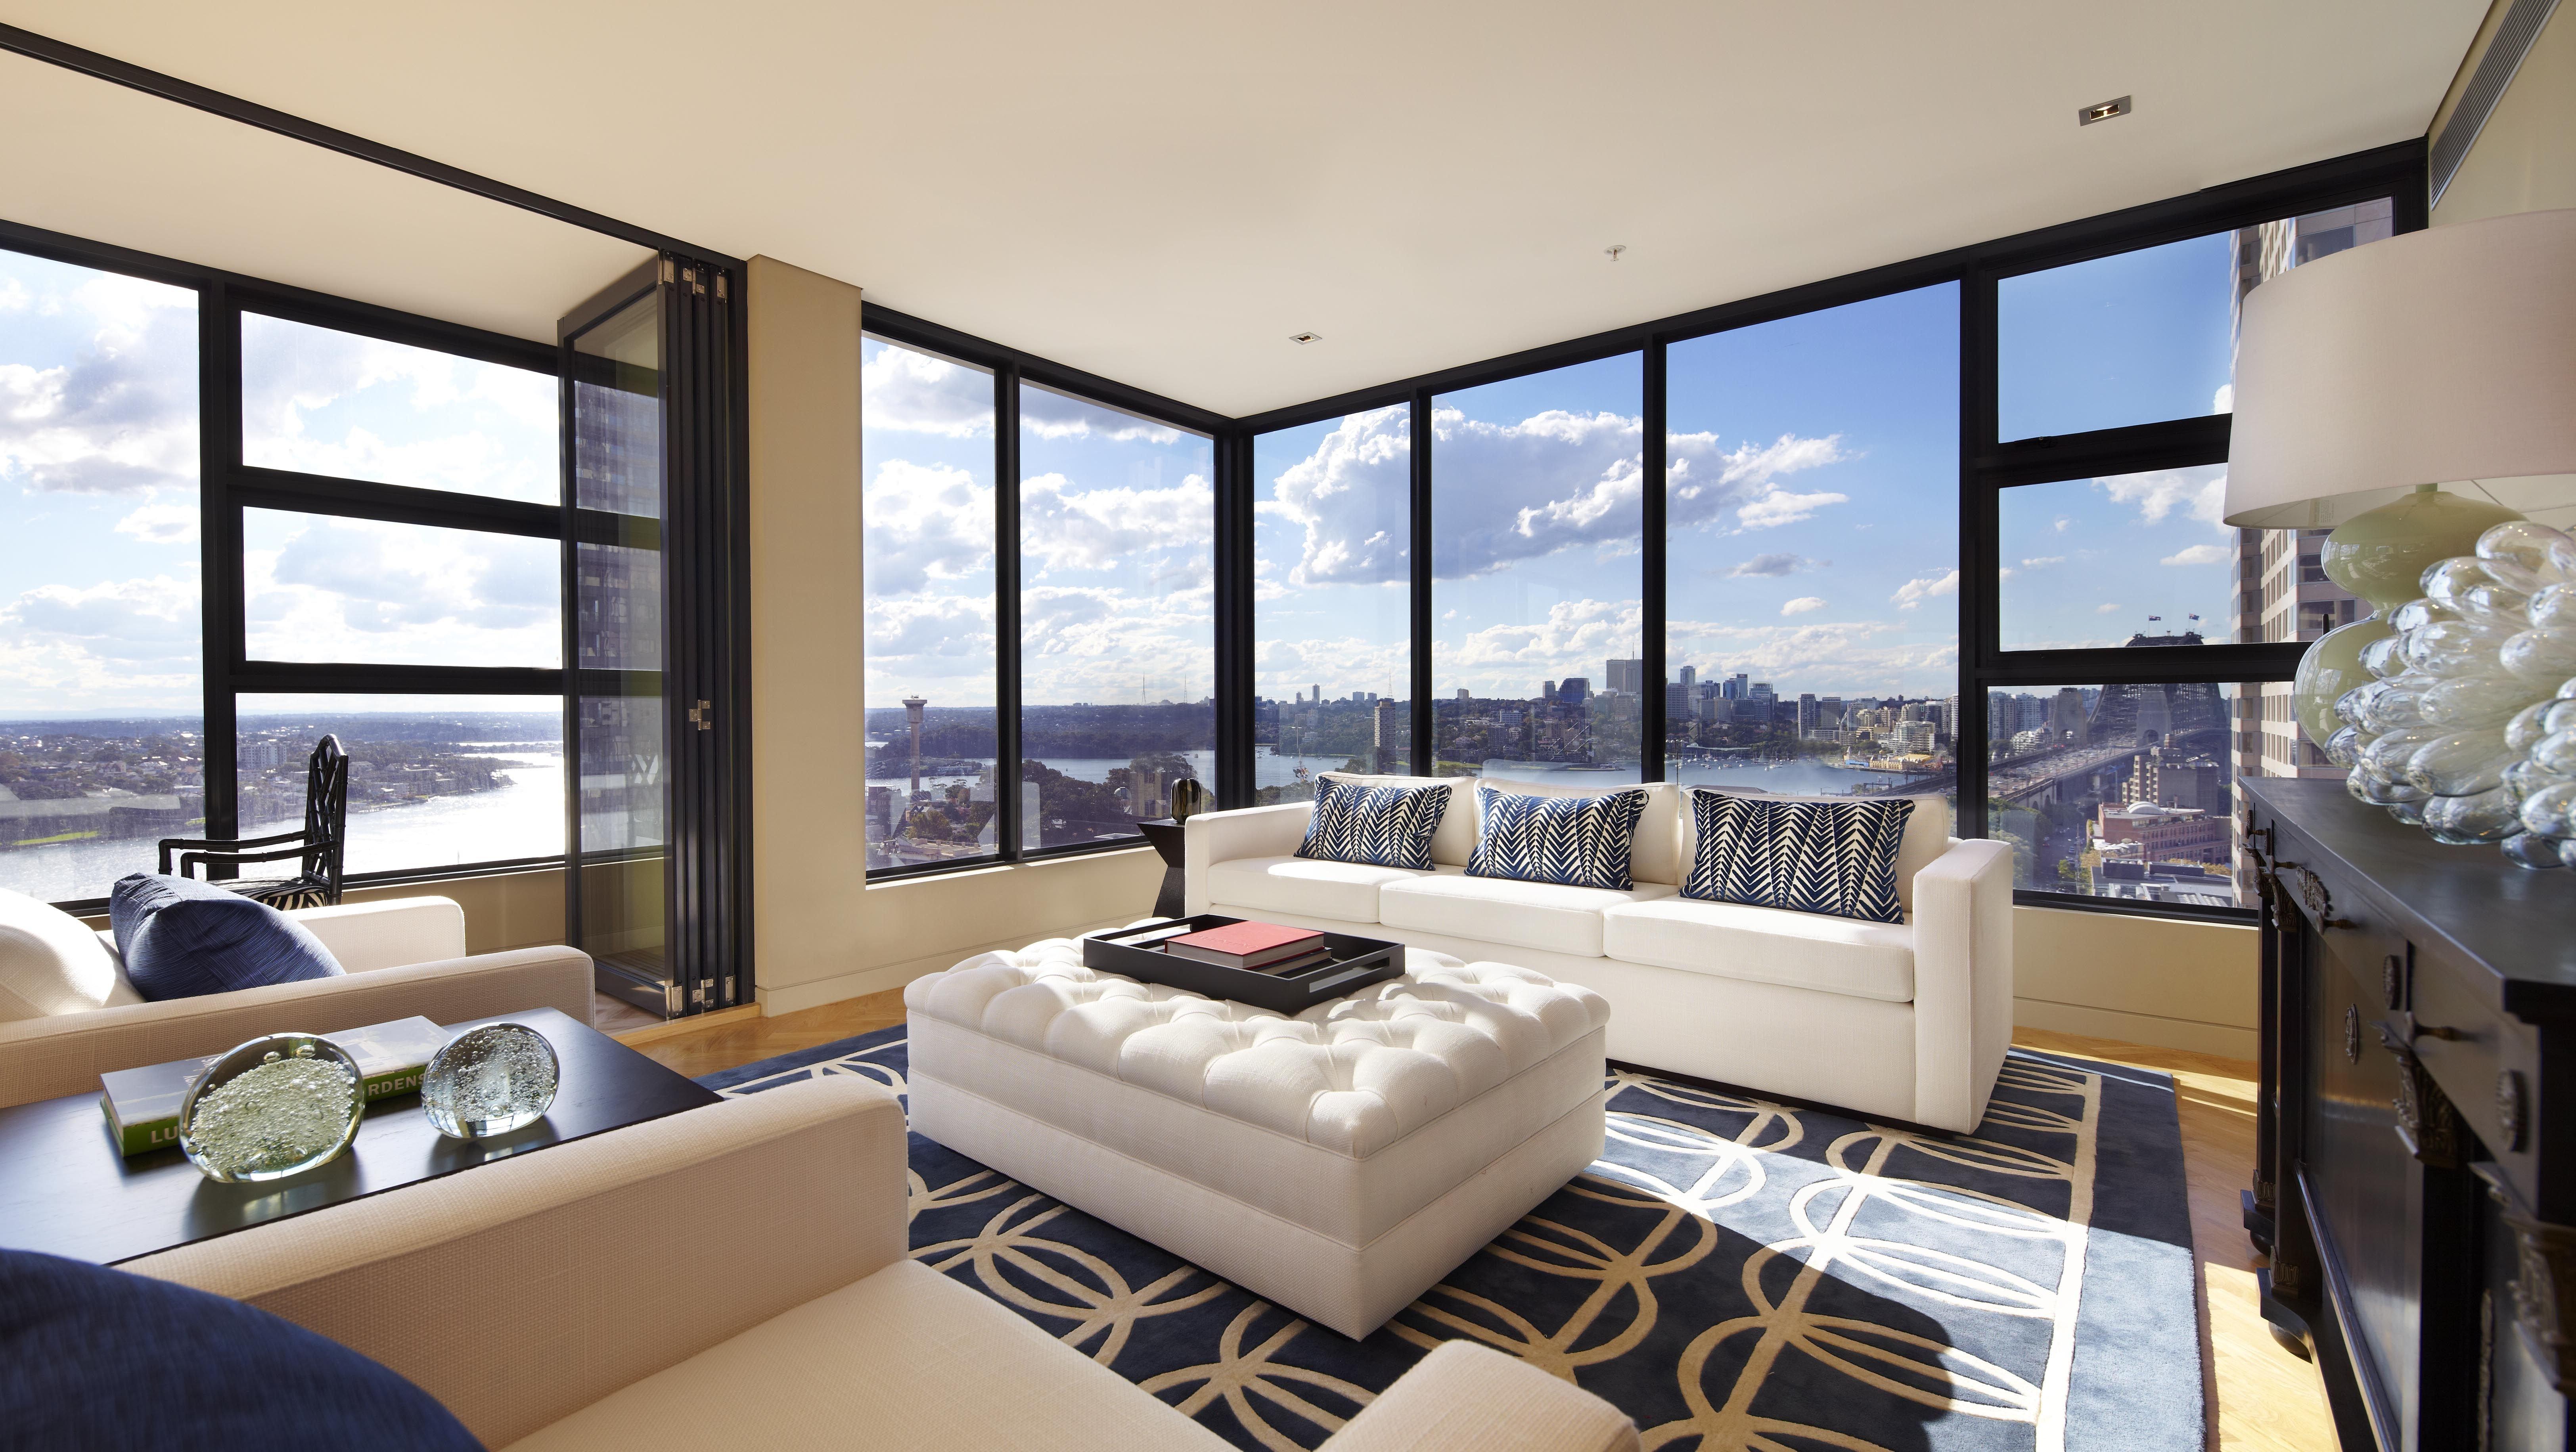 design room house home apartment condo 42 wallpaper background 6497x3661